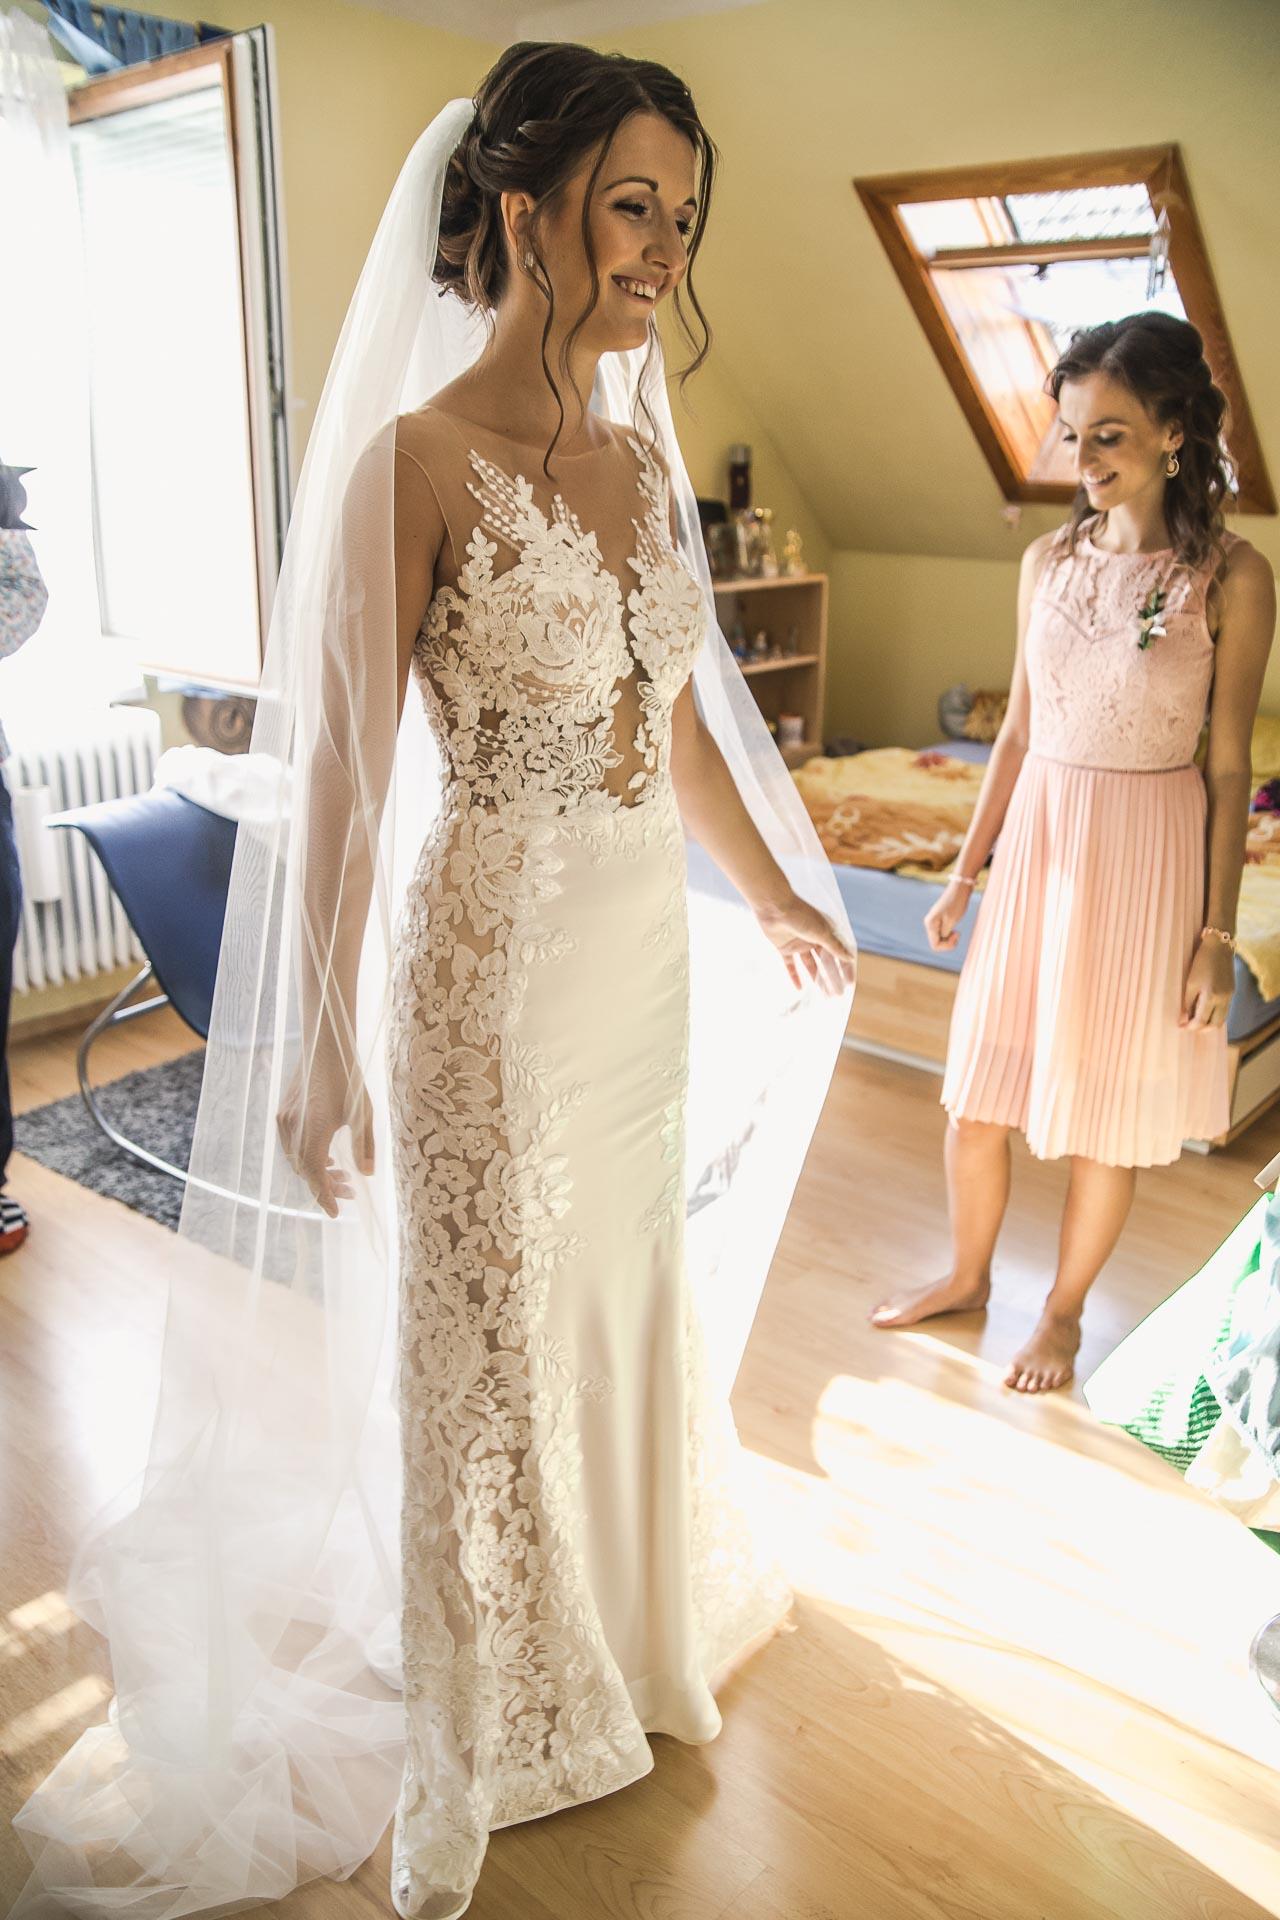 svatební-fotograf-wedding-svatebni-video-orlík-vltava-kostel-statek-stodola-boho-svatba-Beautyfoto-46